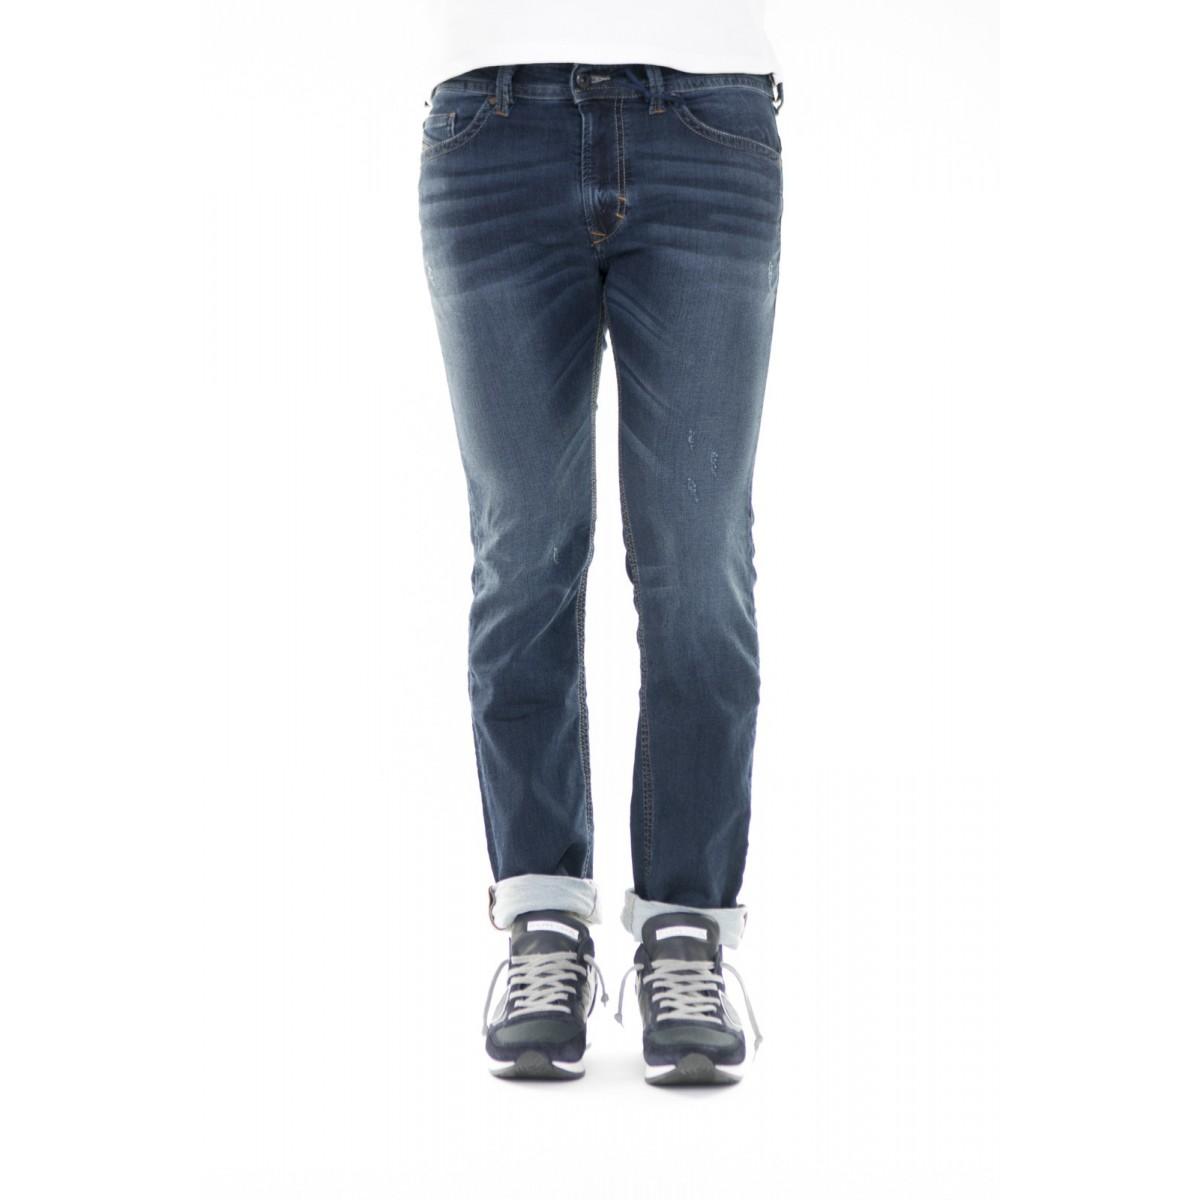 Jeans Diesel - Thavar ne joggy jeans special